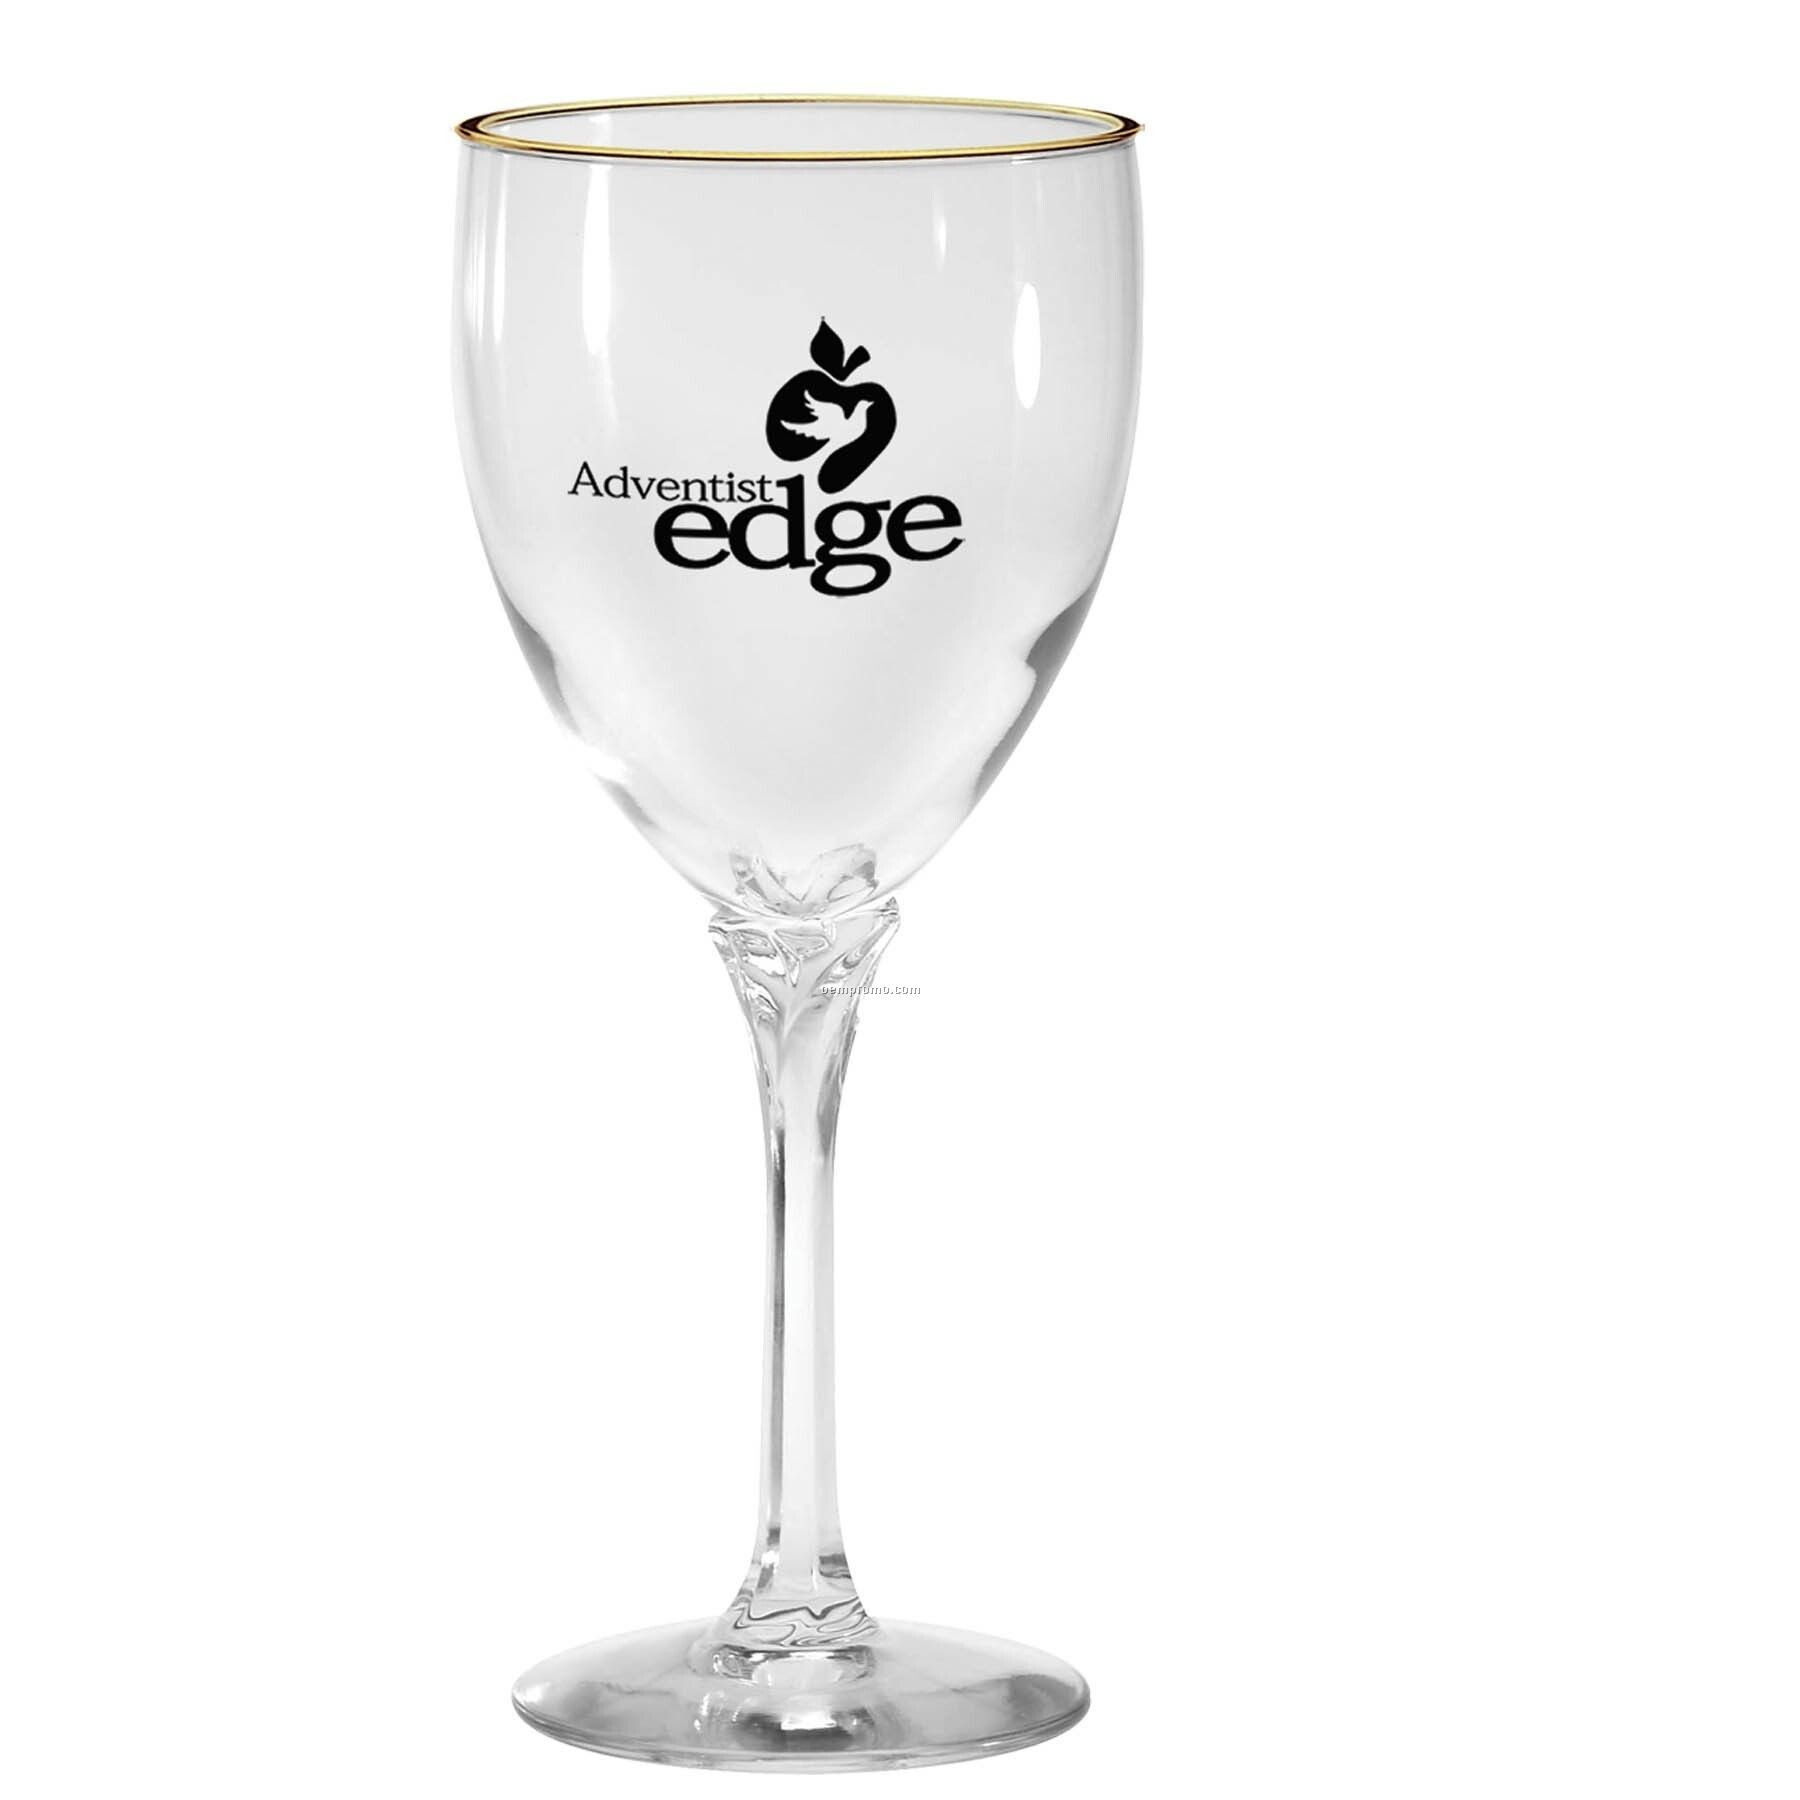 13 Oz. Domaine Stem Wine Glass